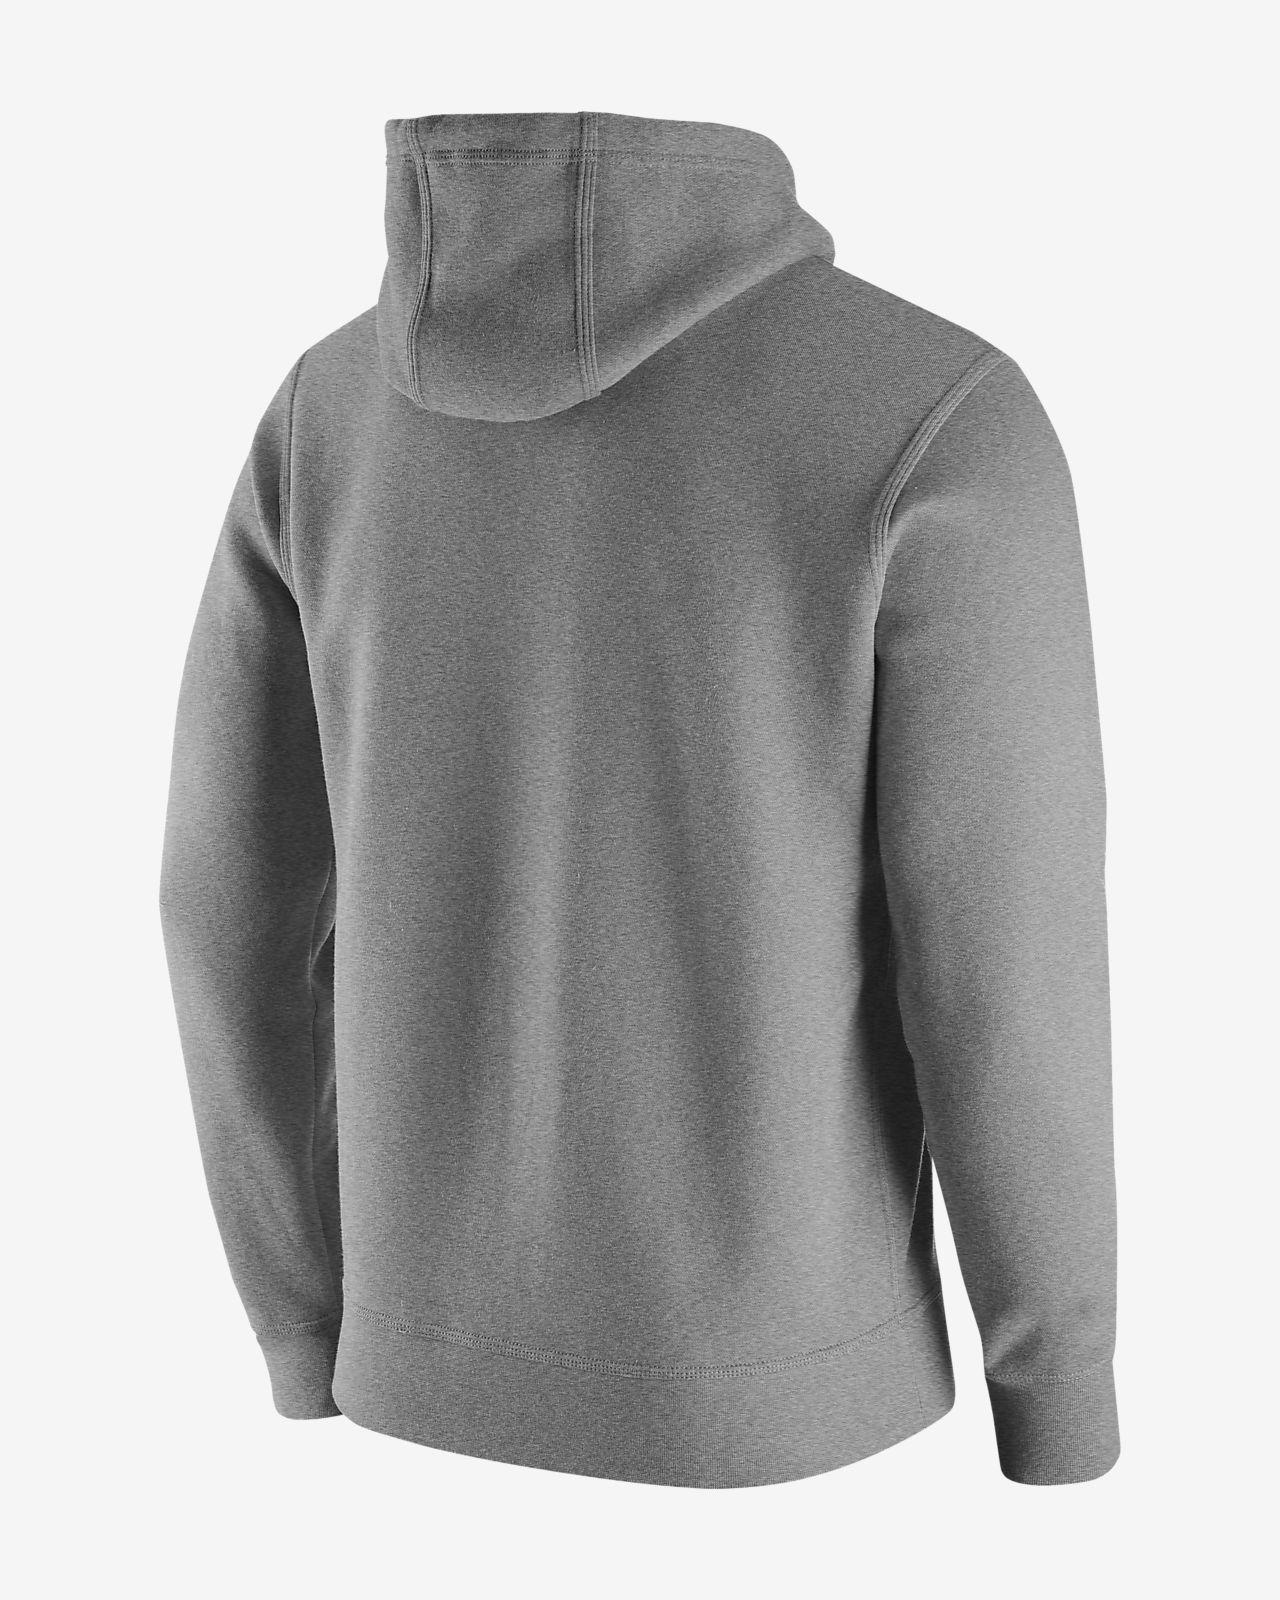 brand new ab80d 52648 Nike Club Fleece (NFL Chargers) Men's Fleece Pullover Hoodie